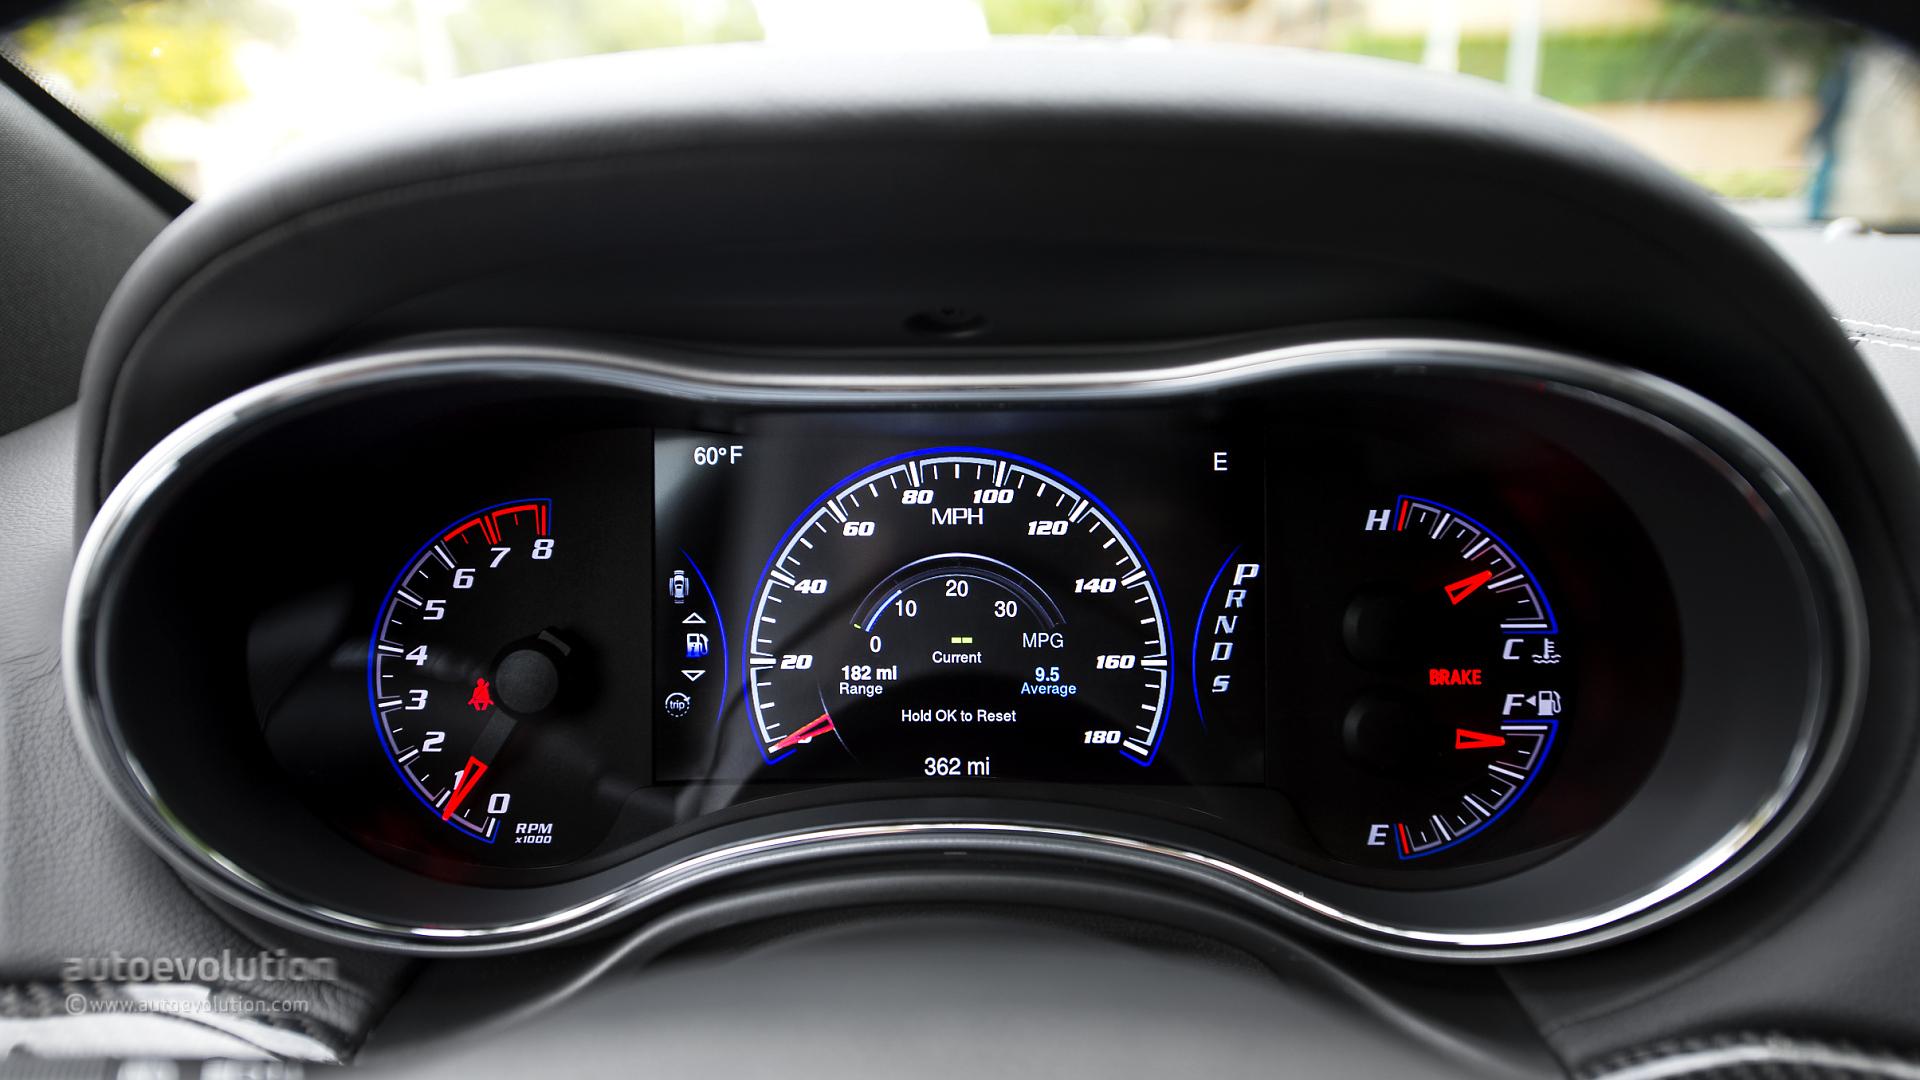 Jeep Grand Cherokee Dash Symbols Dashboard Lights